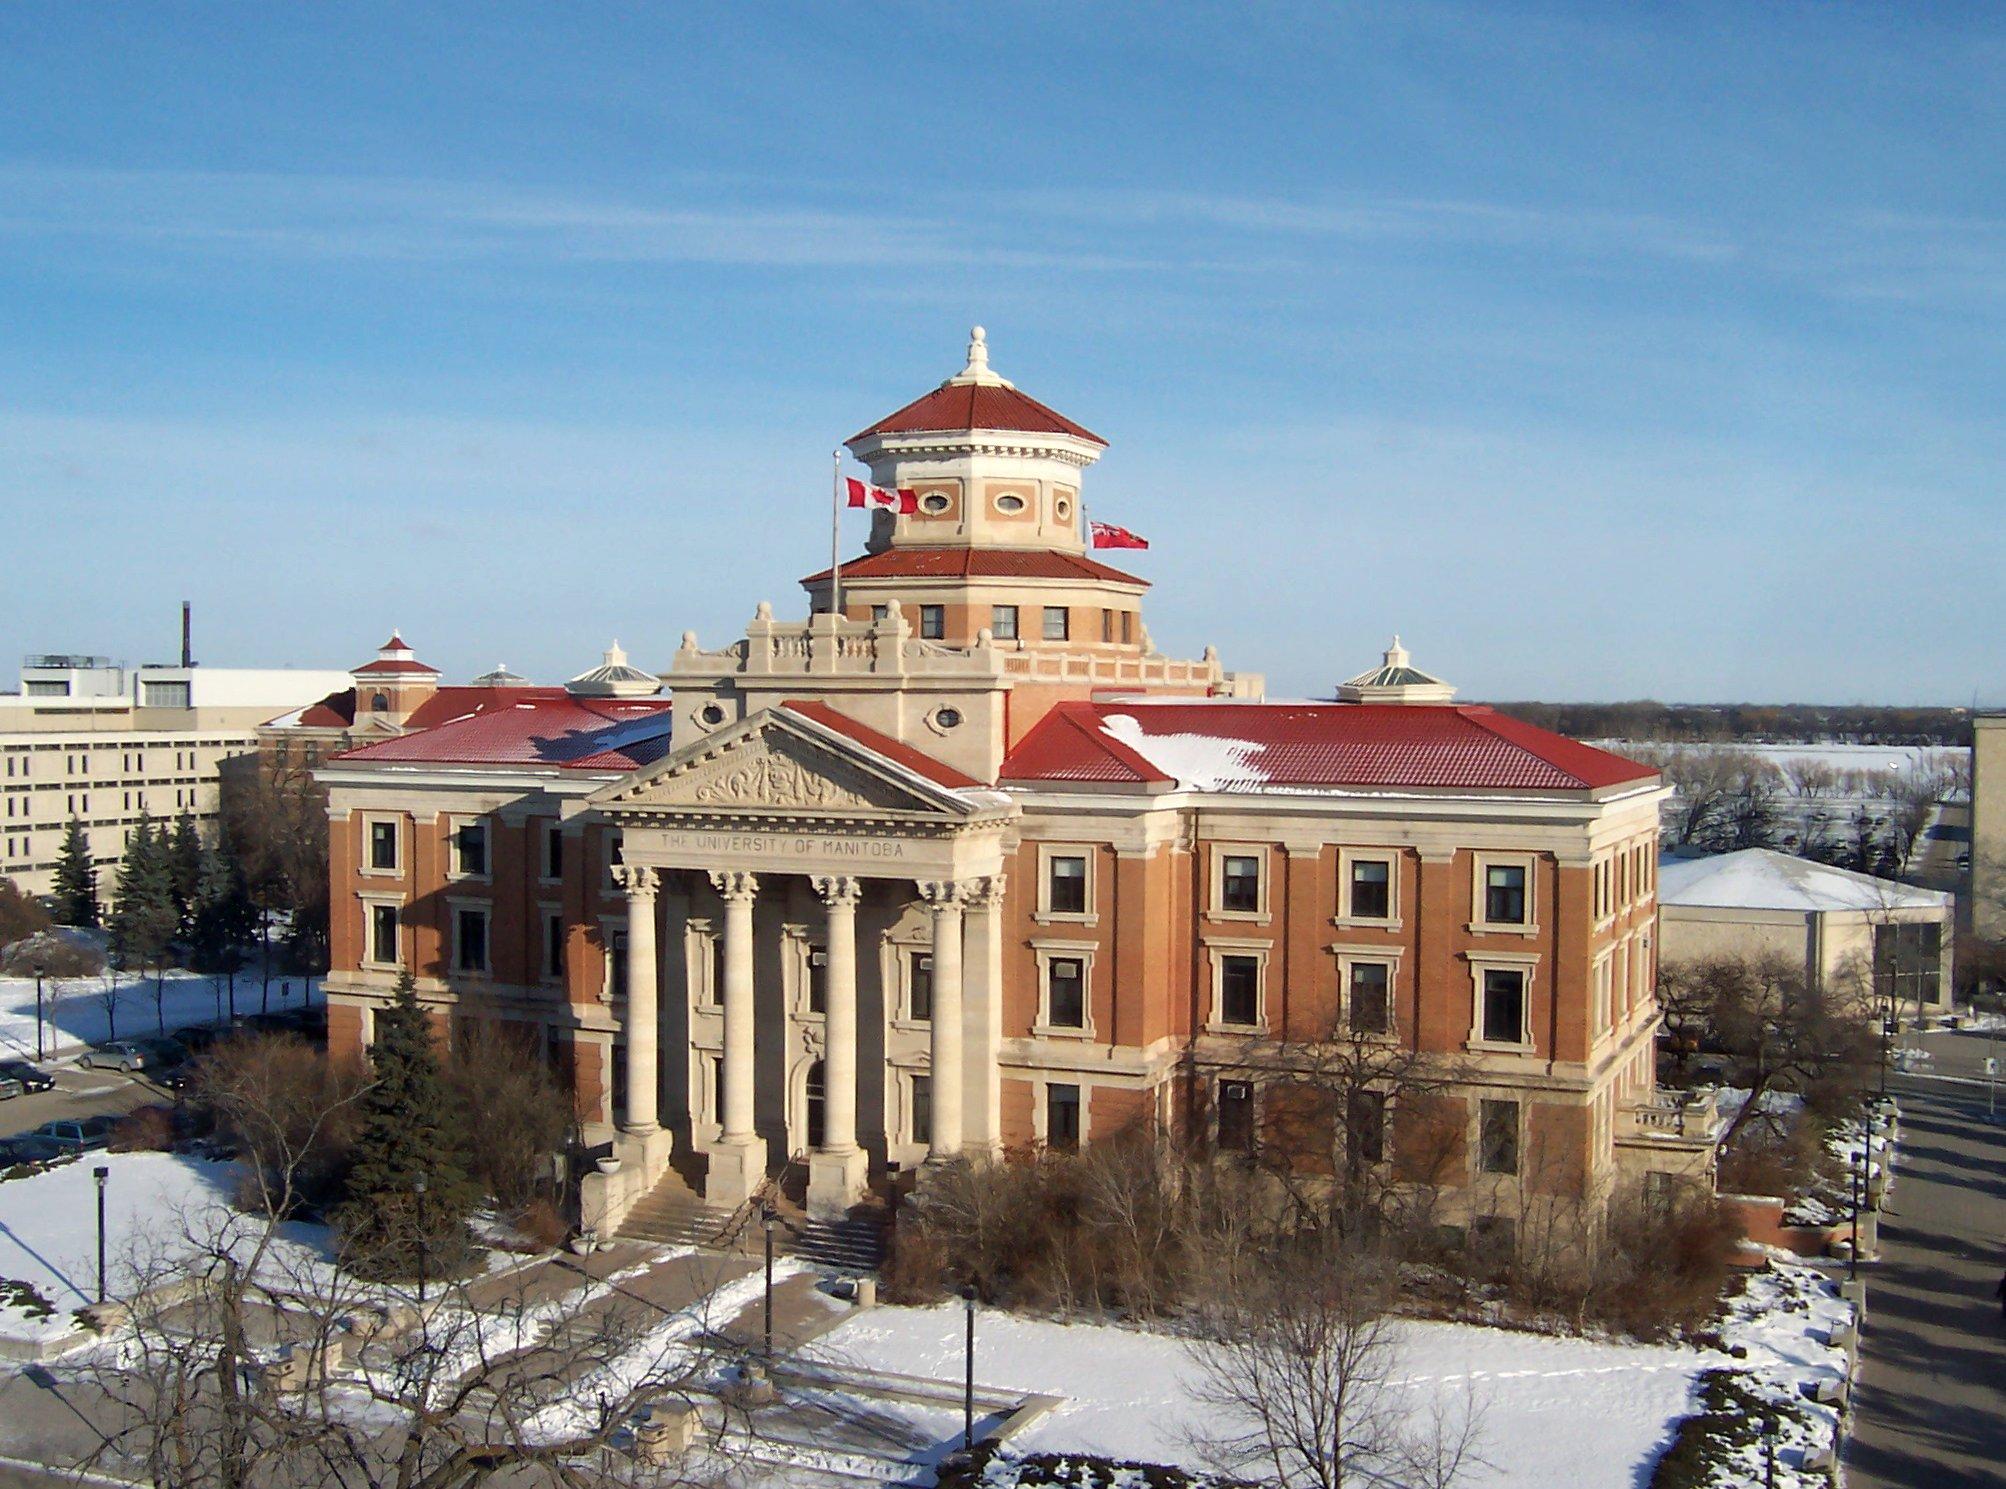 University of Manitoba, Winnipeg